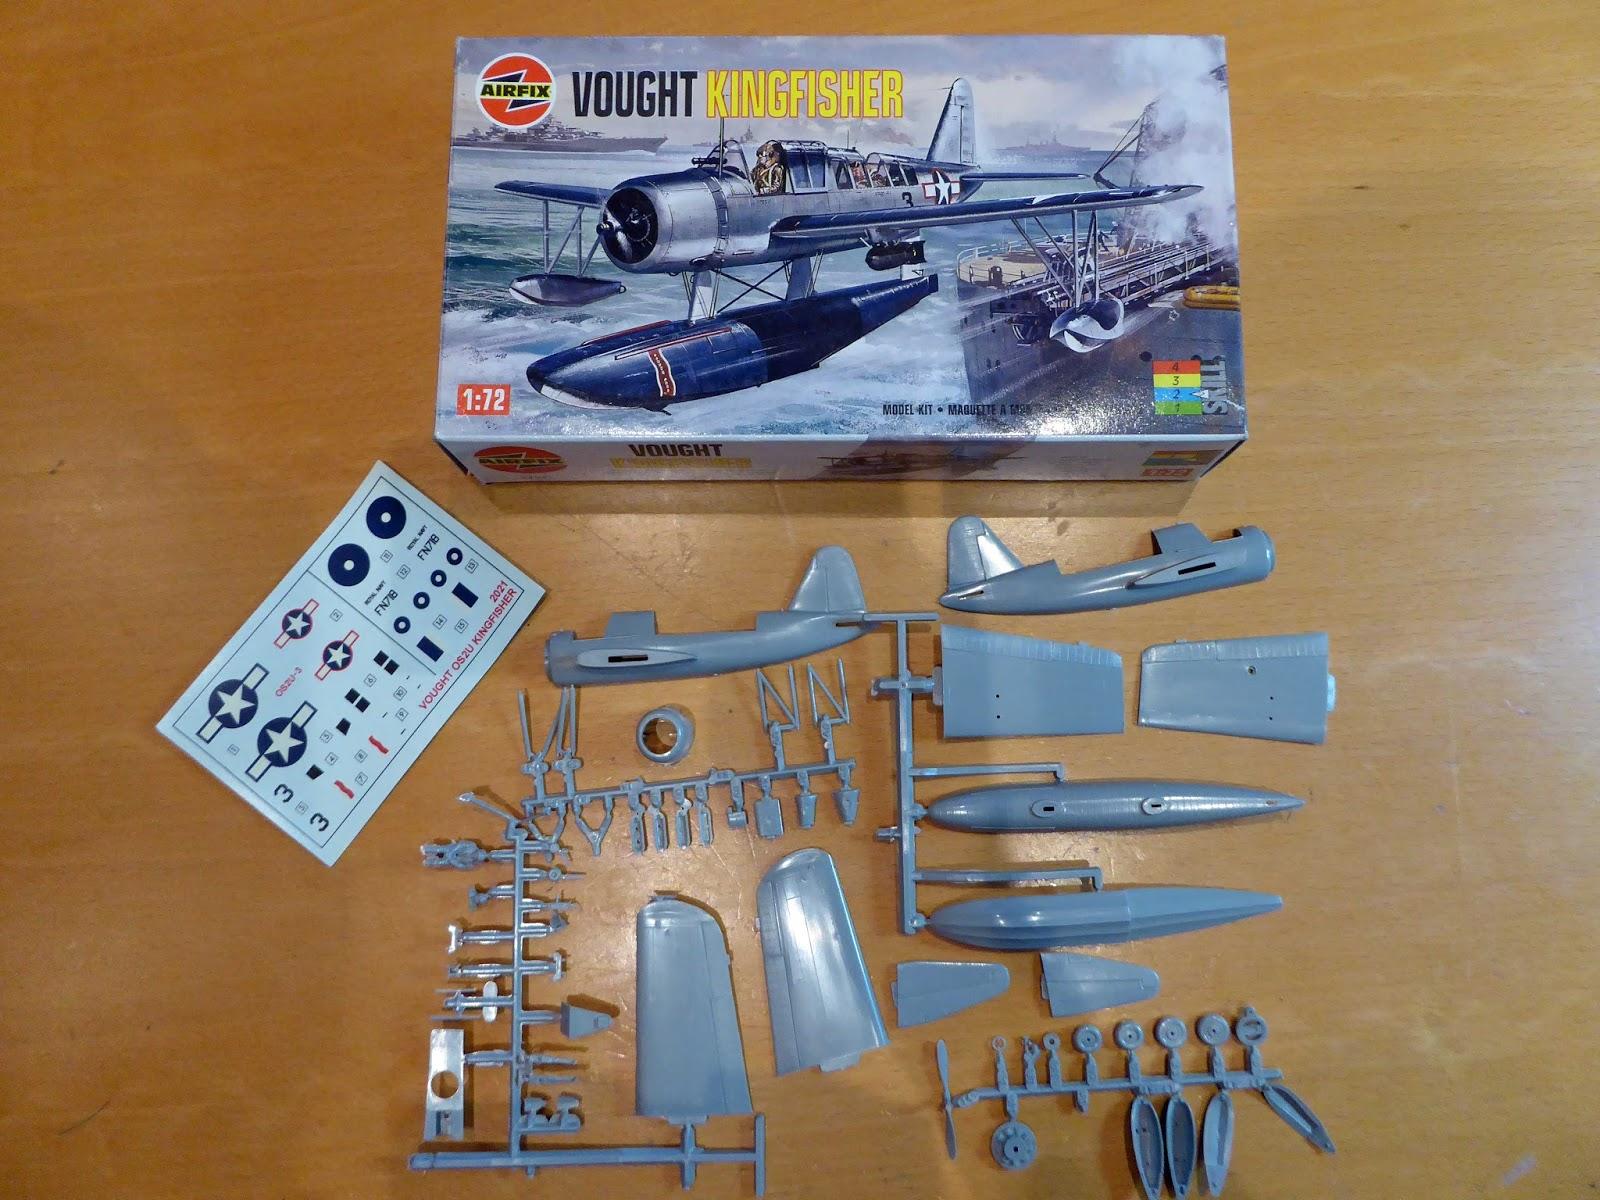 Airfix Kingfisher - Radial Engines Rock GB - Britmodeller com